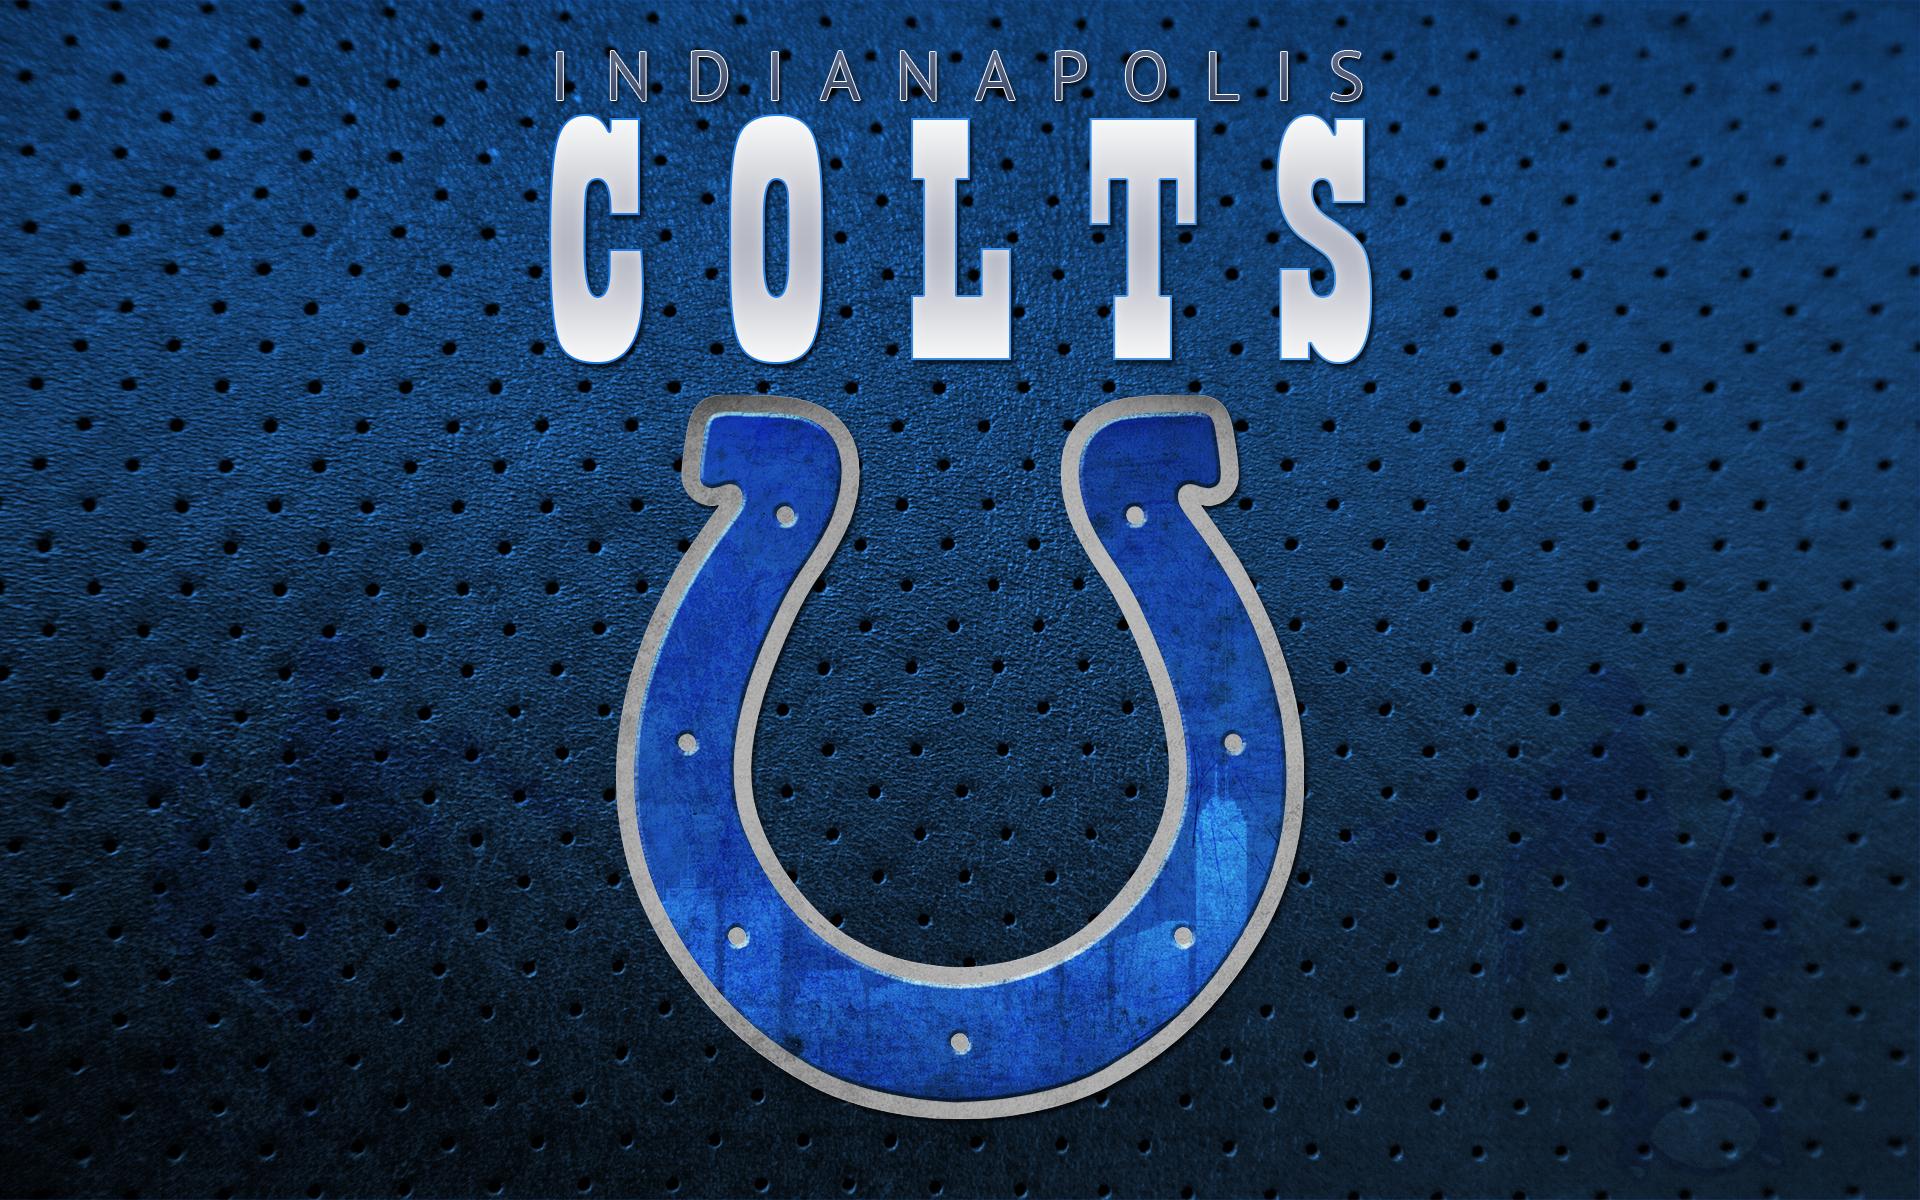 Indianapolis Colts Logo Wallpaper 1920x1200